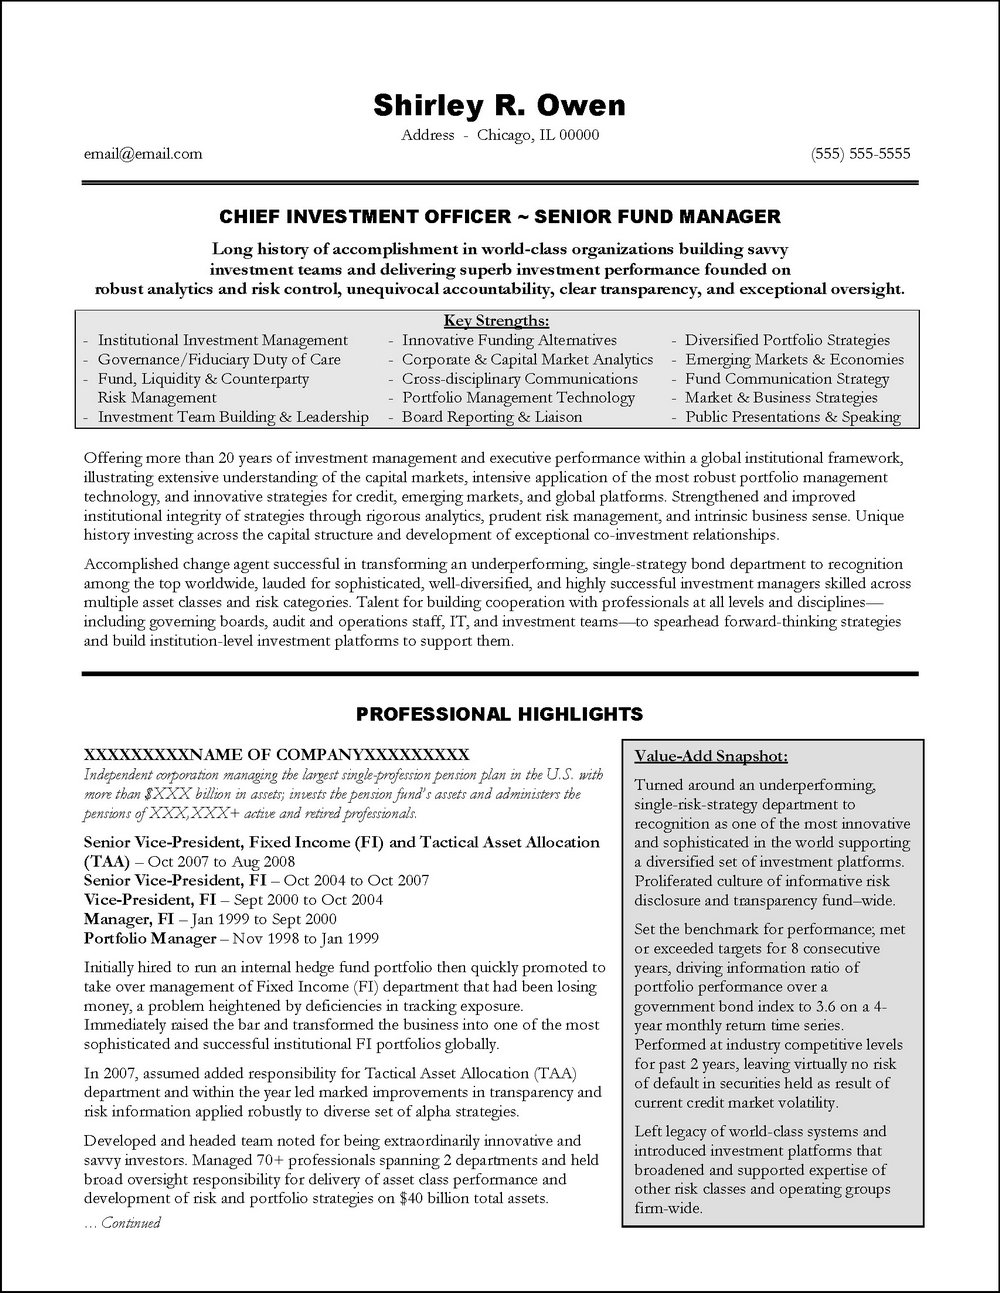 Senior Executive Resume Template - Resumes #MTk5OA | Resume ...